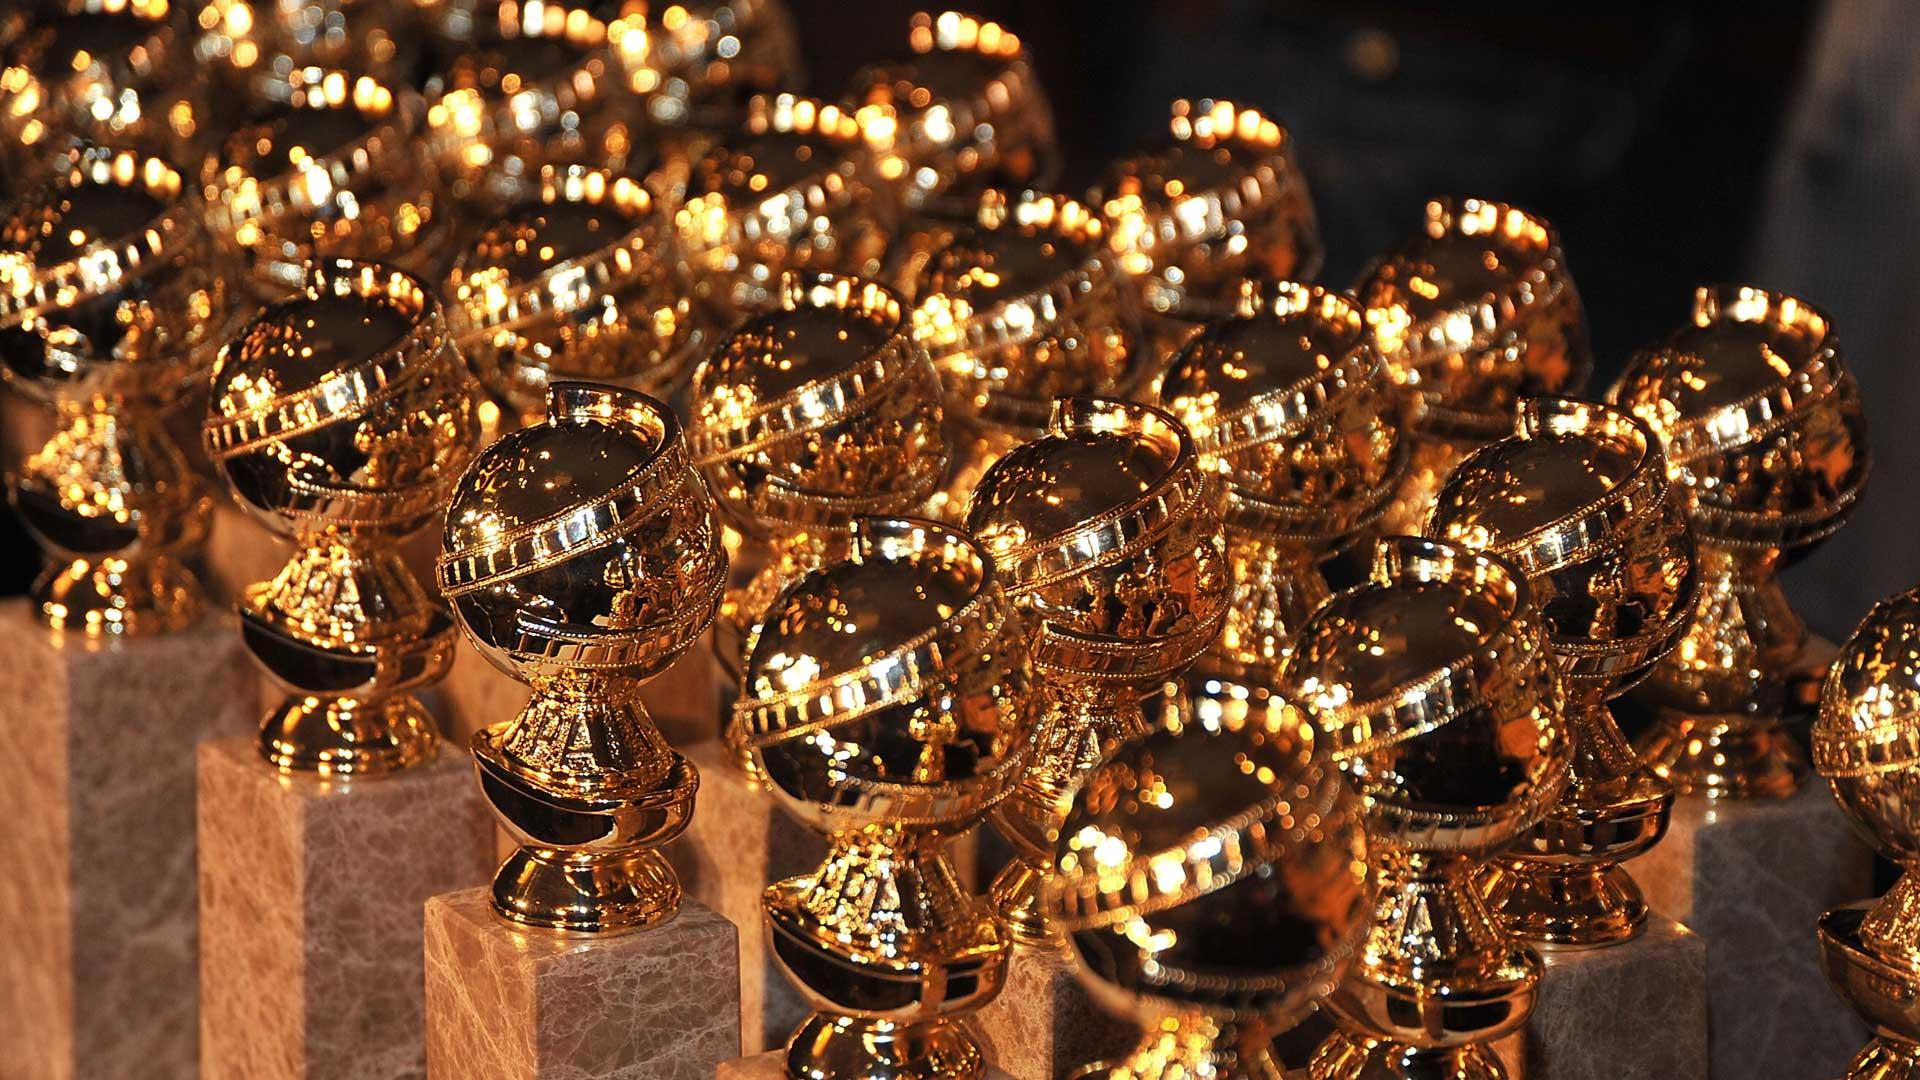 اعلام تاریخ برگزاری مراسم Golden Globes سال ۲۰۲۲ بدون پخش تلویزیونی